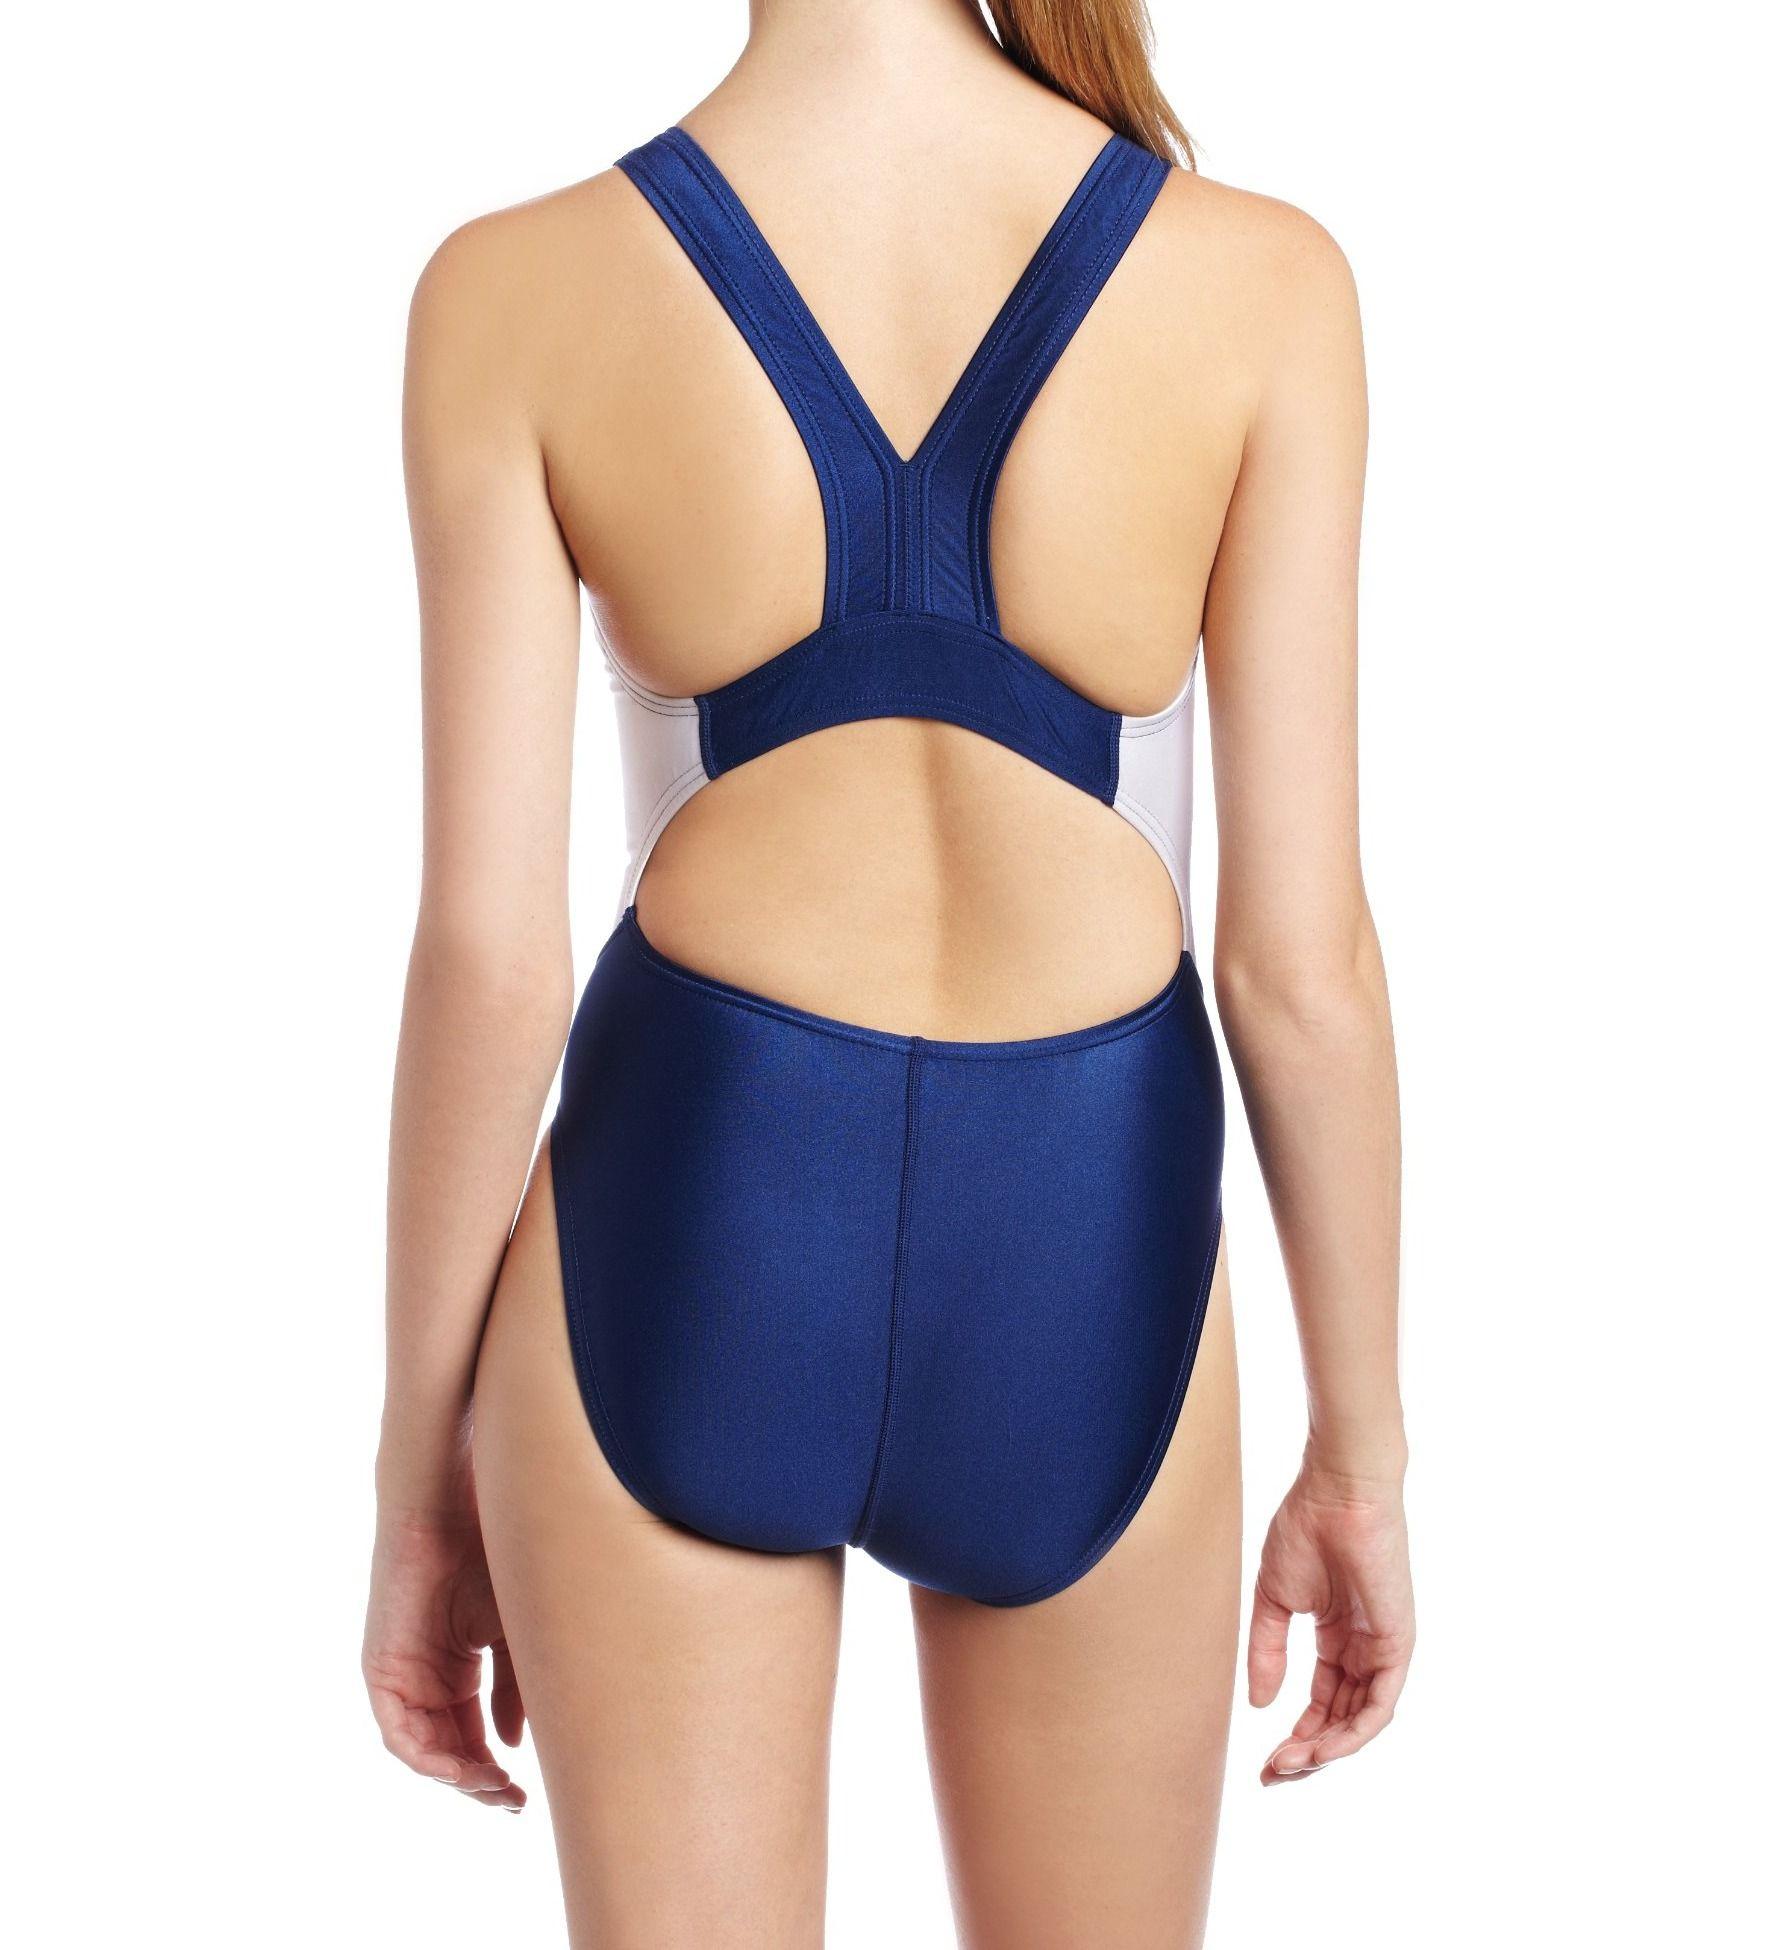 7d192e3353 Speedo Women's Race Quantum Splice Super Pro Swimsuit, Black and Green, 38# Quantum, #Splice, #Race